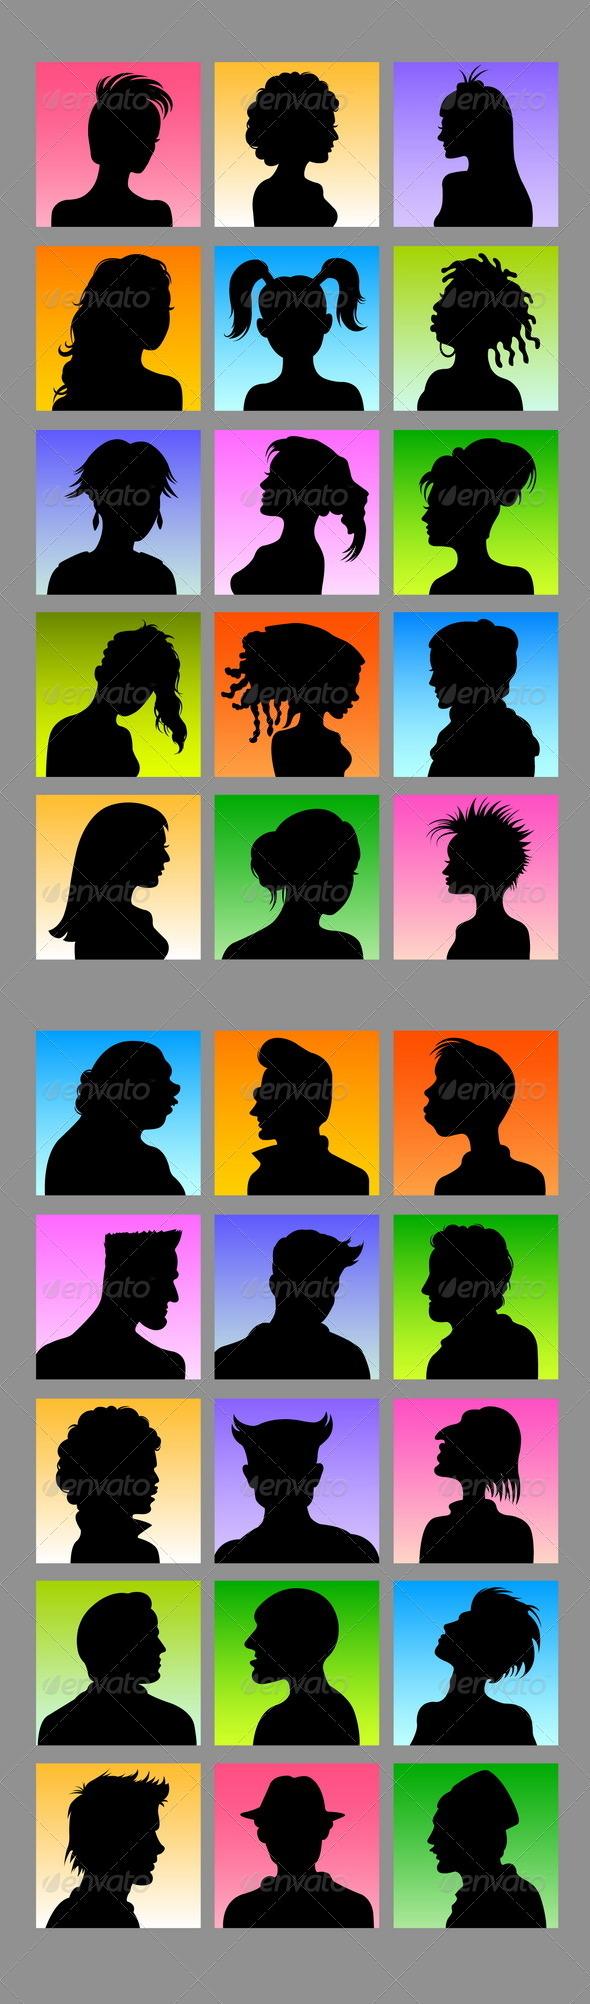 GraphicRiver Avatars 4092013 Created: 6 March 13